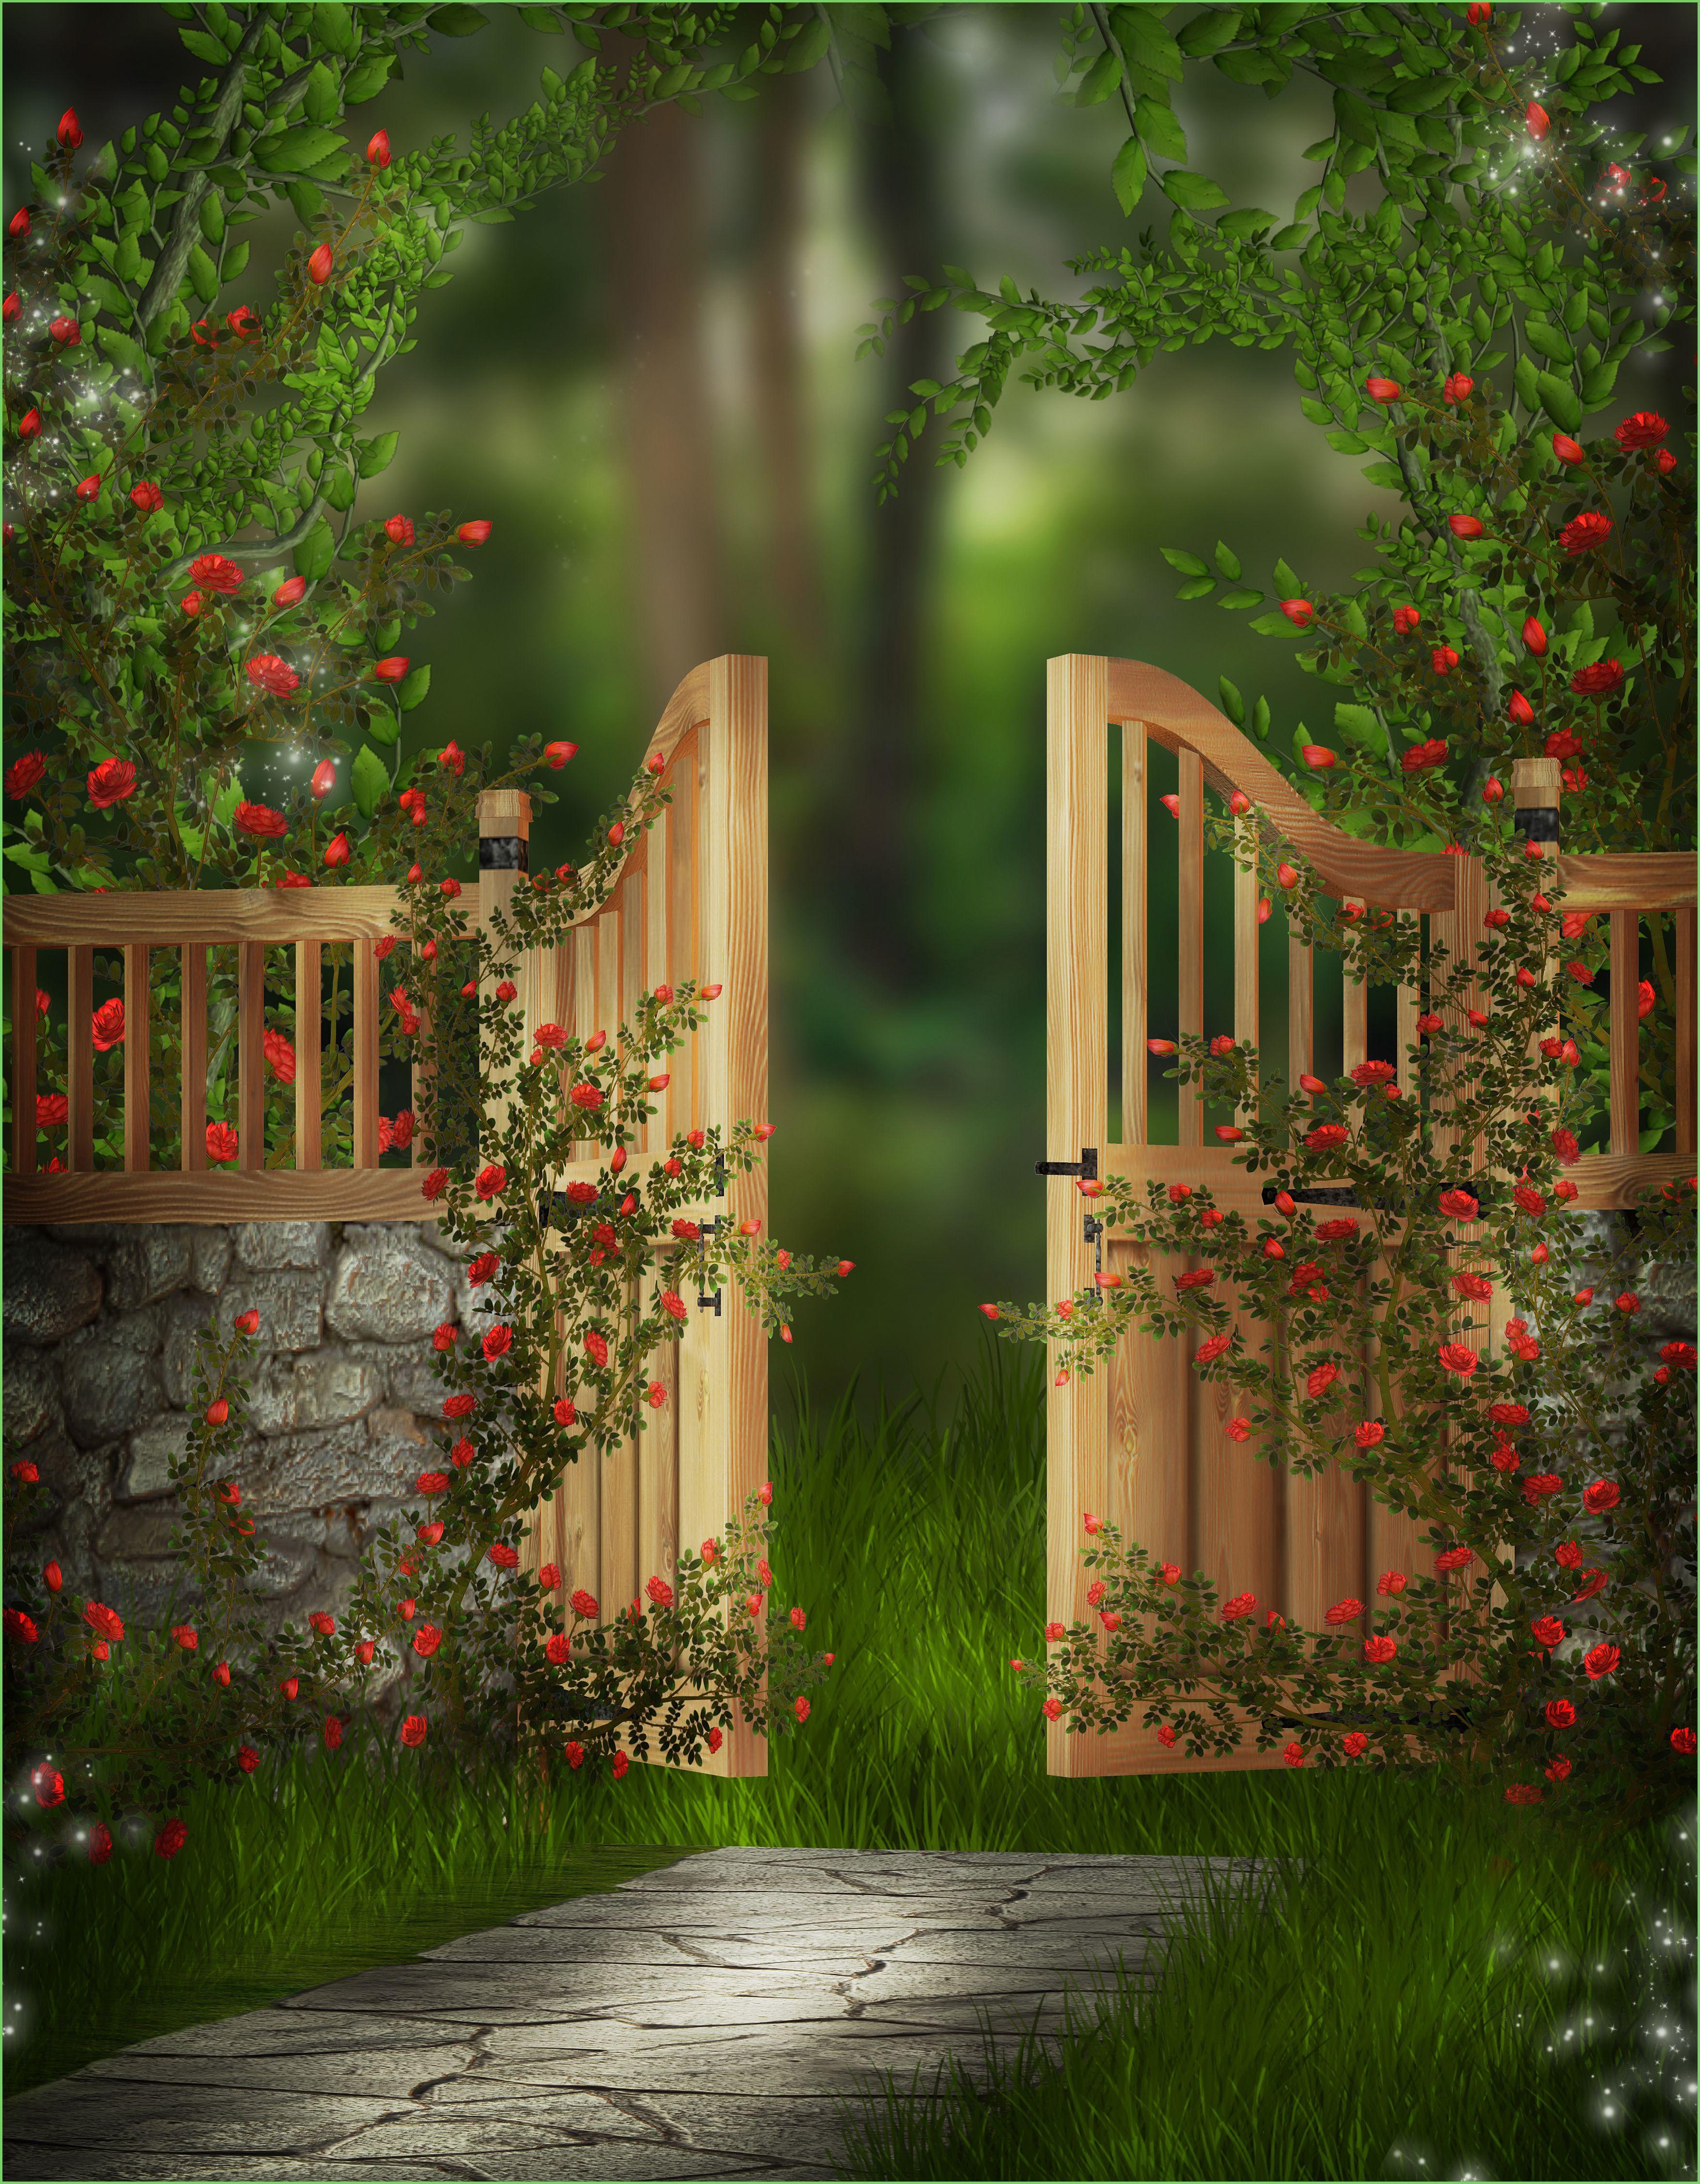 What lies beyond the garden gate ... | PATHS THAT BECKON | Pinterest ...